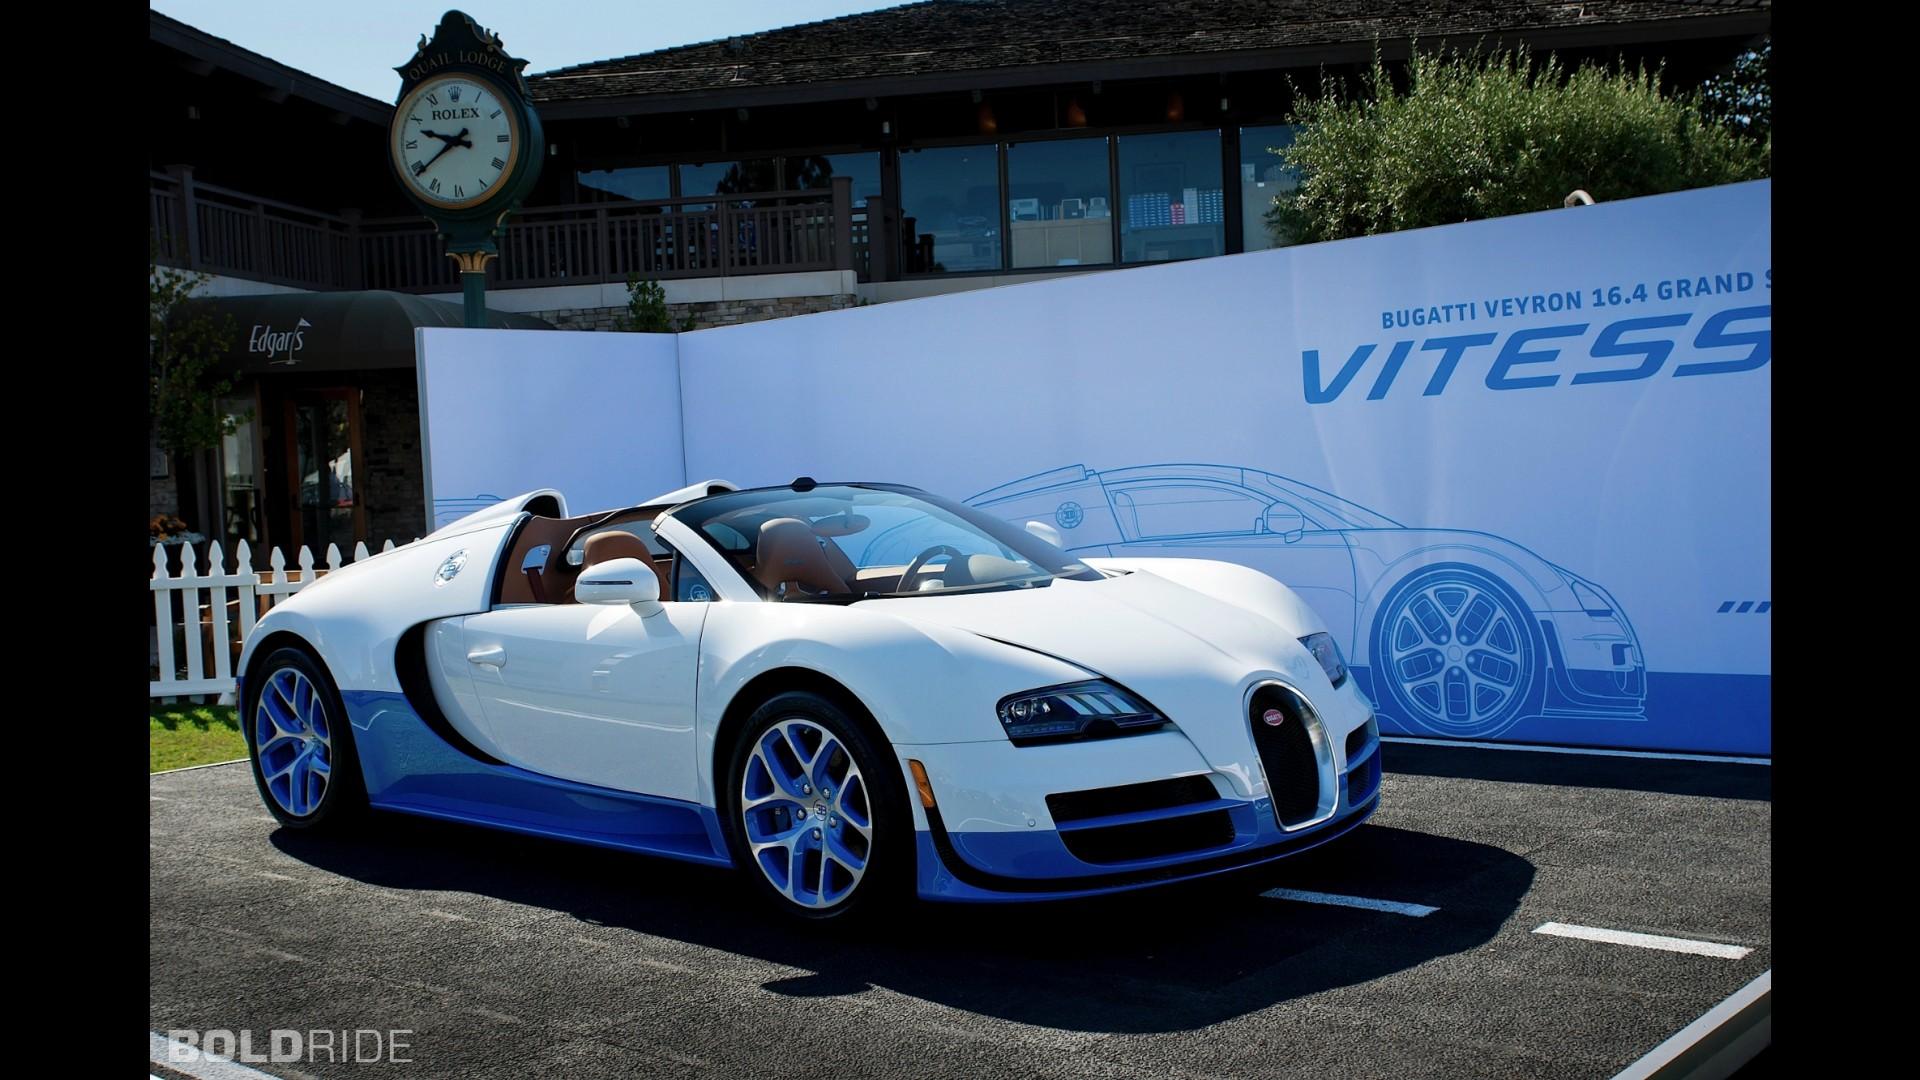 bugatti-veyron-16-4-grand-sport-vitesse-special-edition Stunning Bugatti Veyron 16.4 Grand Sport Vitesse Interior Cars Trend